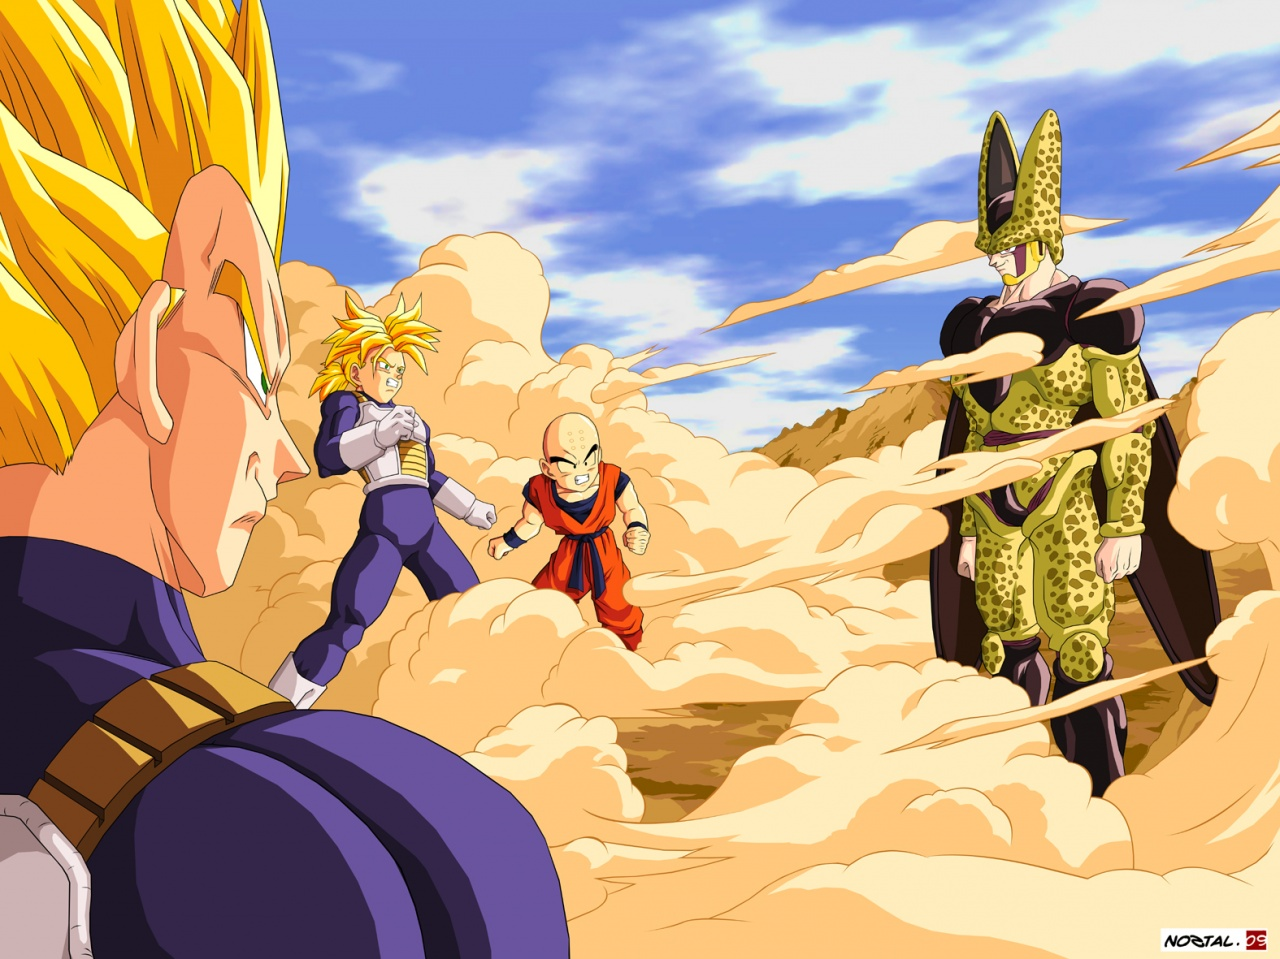 Dragon Ball Z en batalla Fondos de Pantalla   Imagenes Hd  Fondos 1280x959